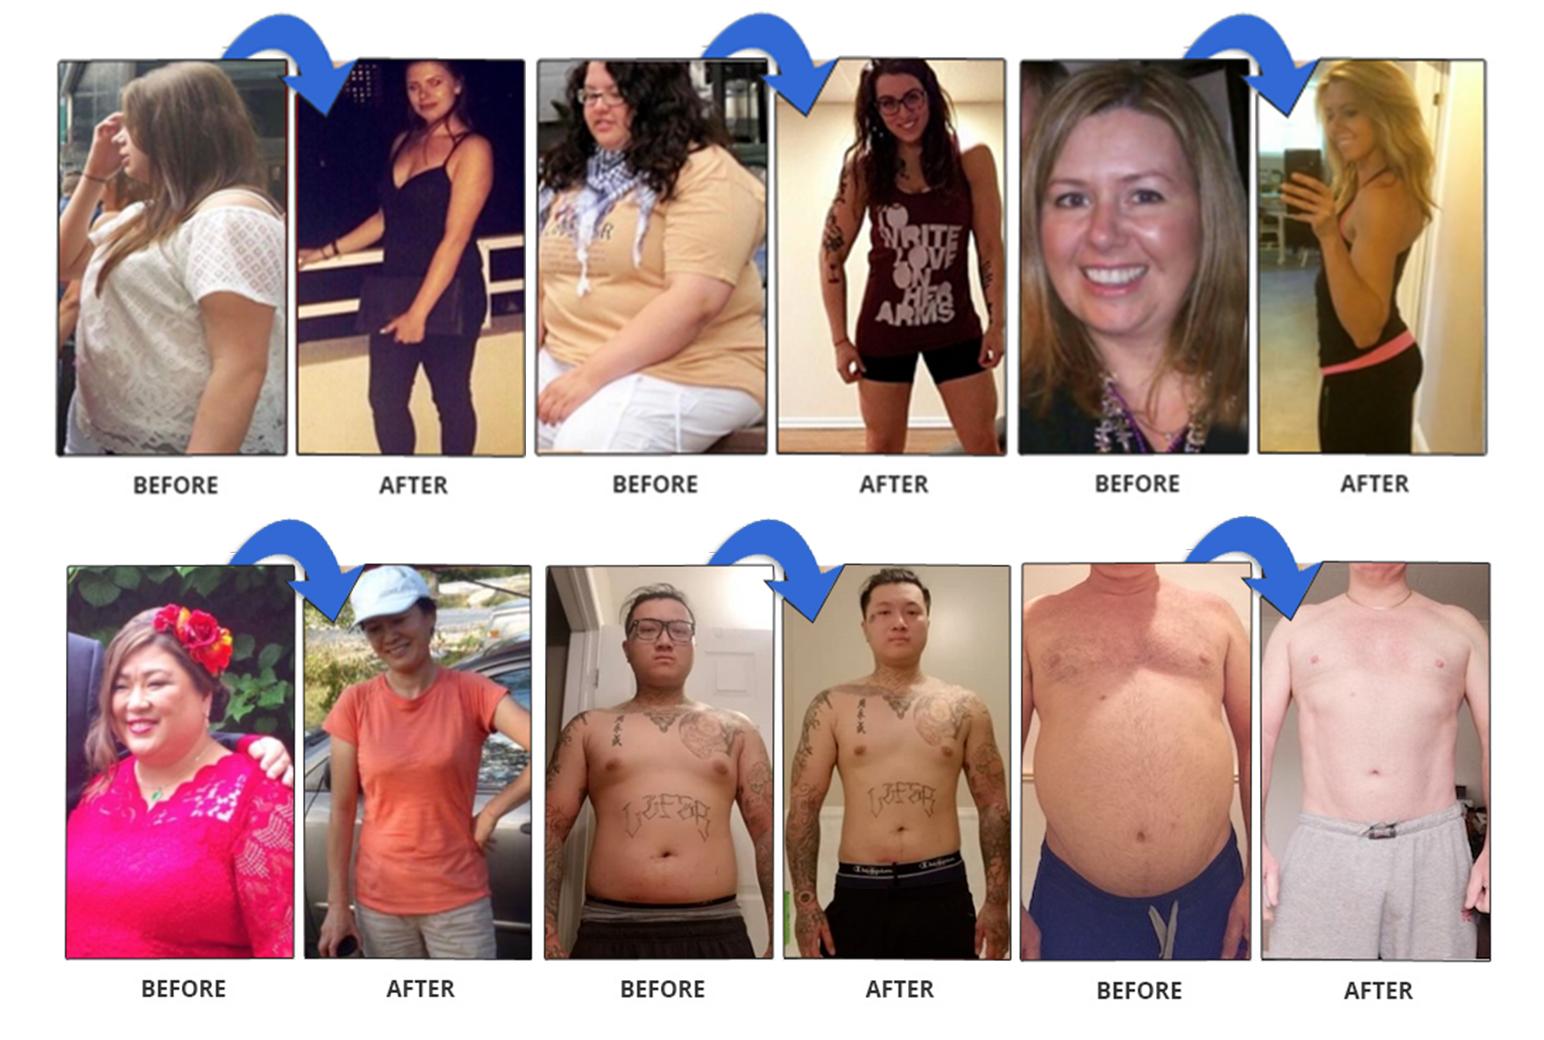 Lean Body Hacks results